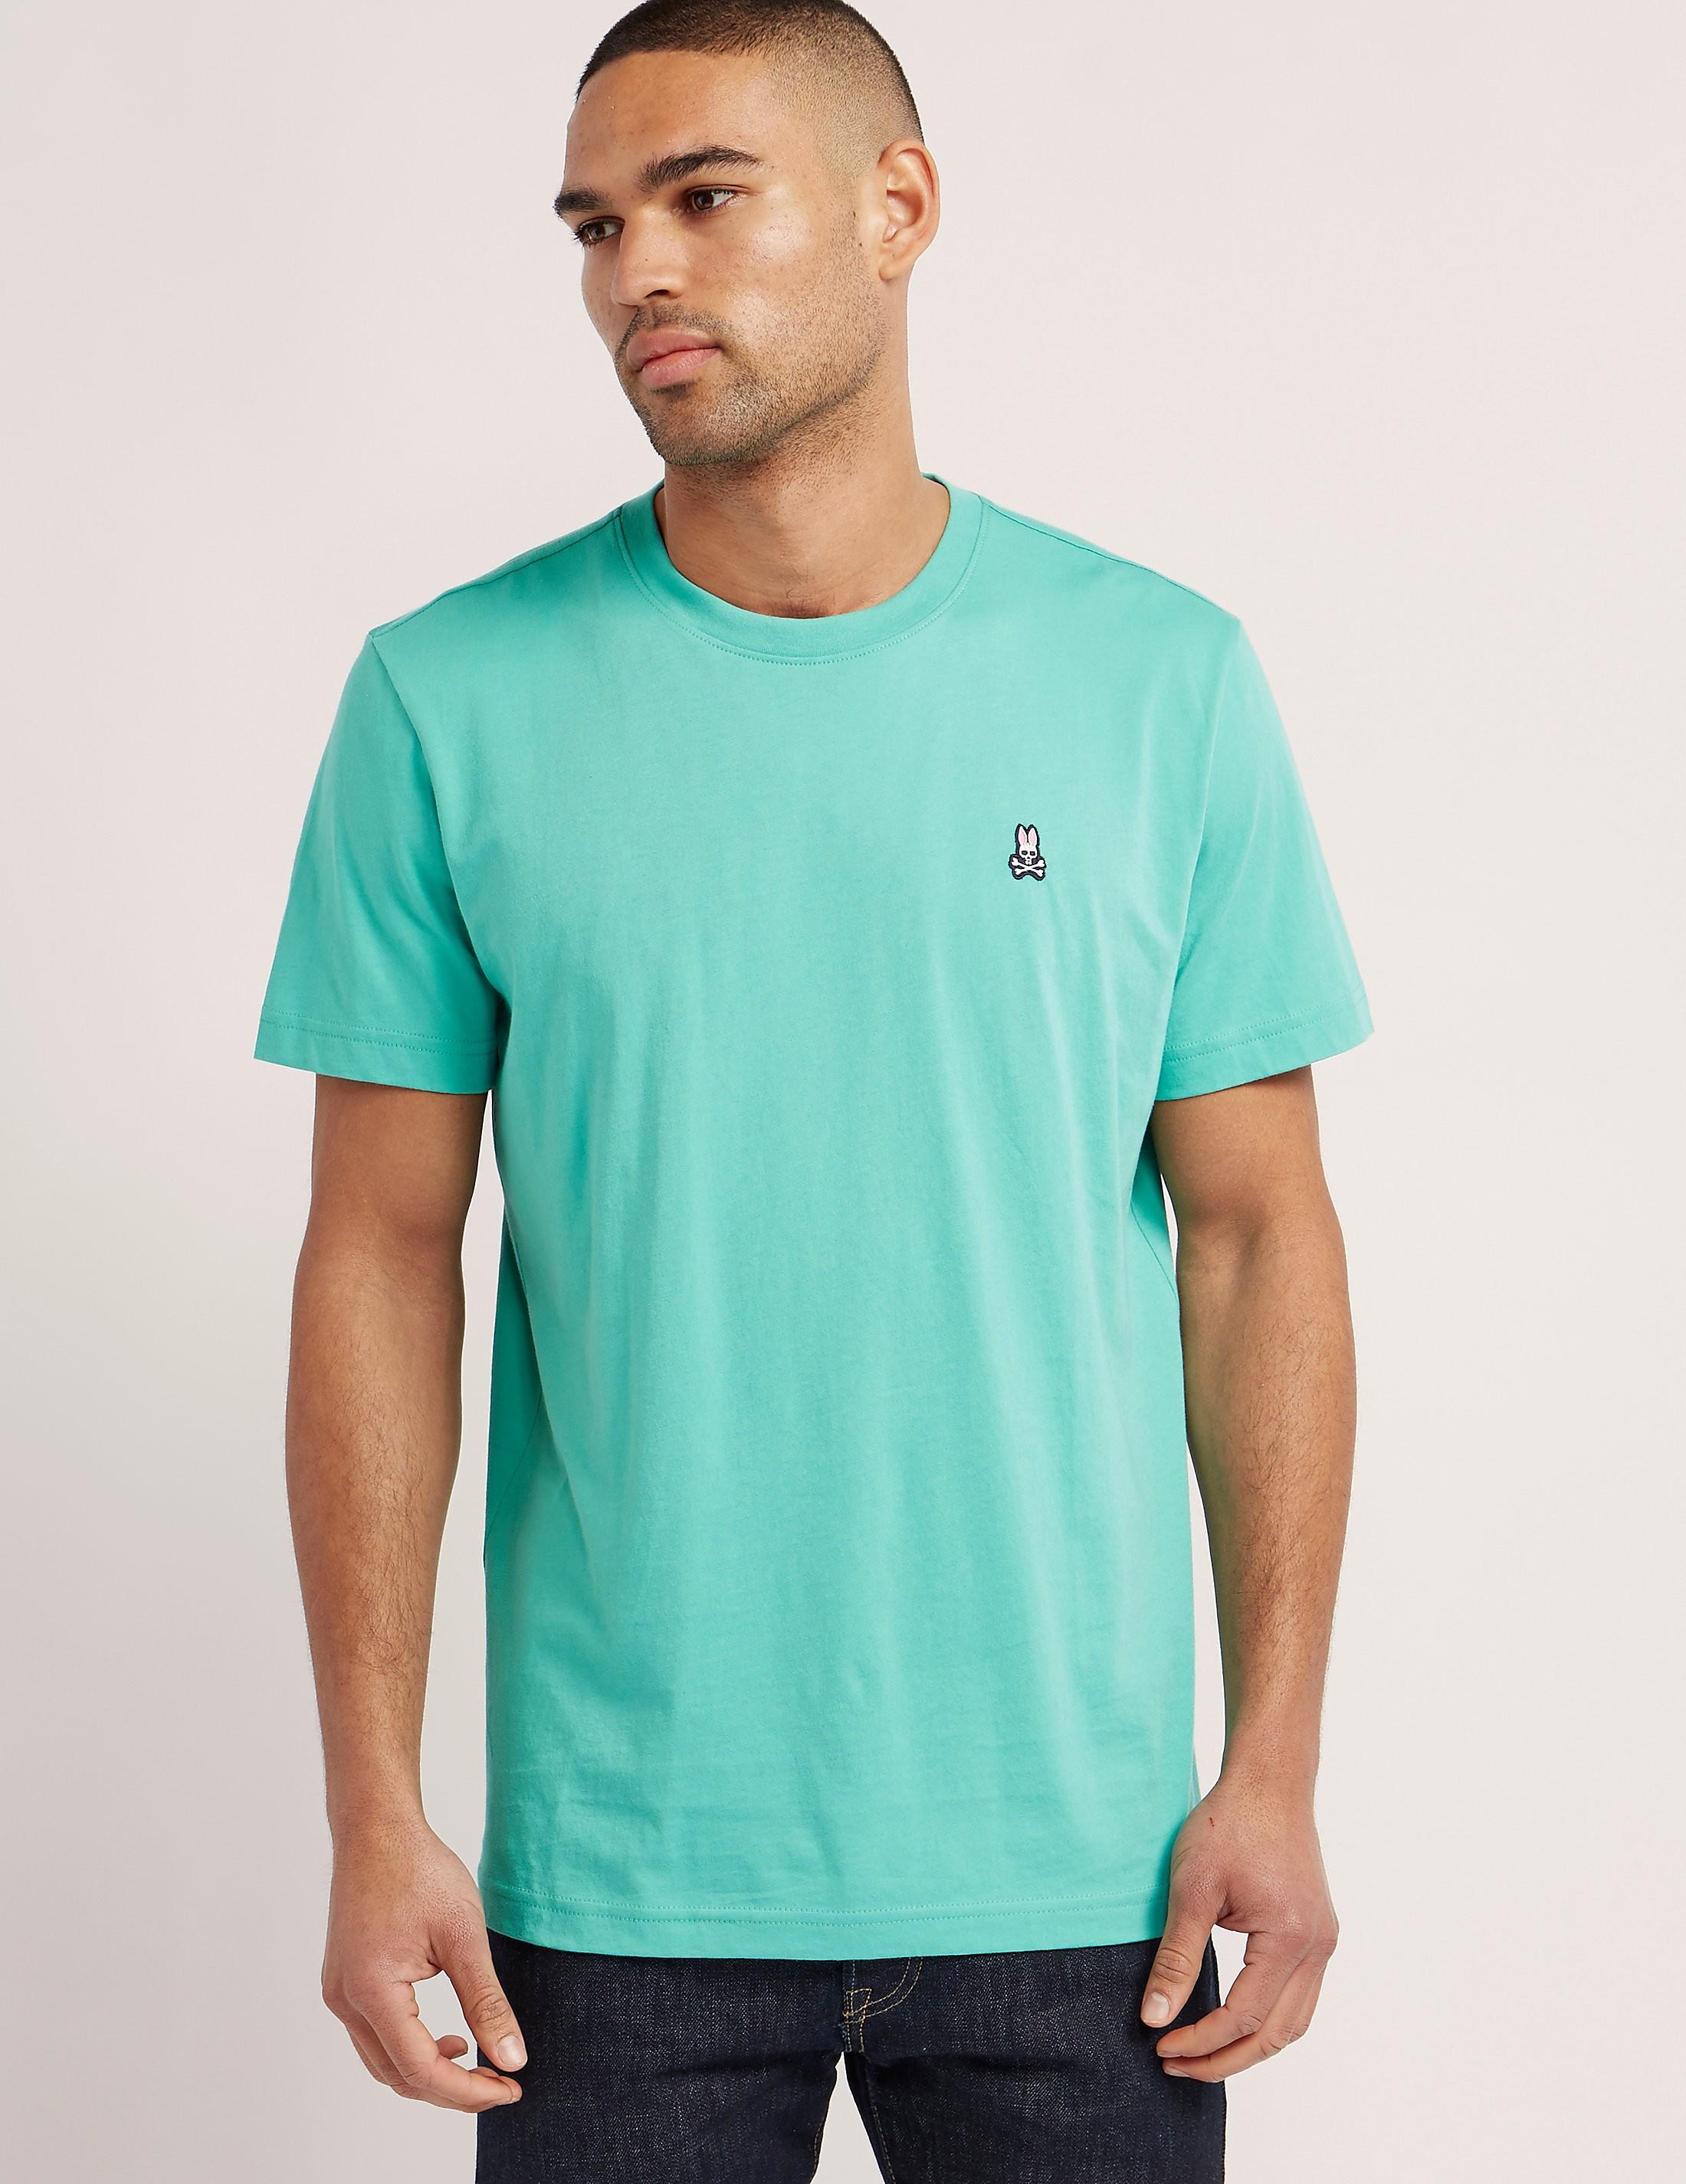 Psycho Bunny Basic Crew T-Shirt - Exclusive